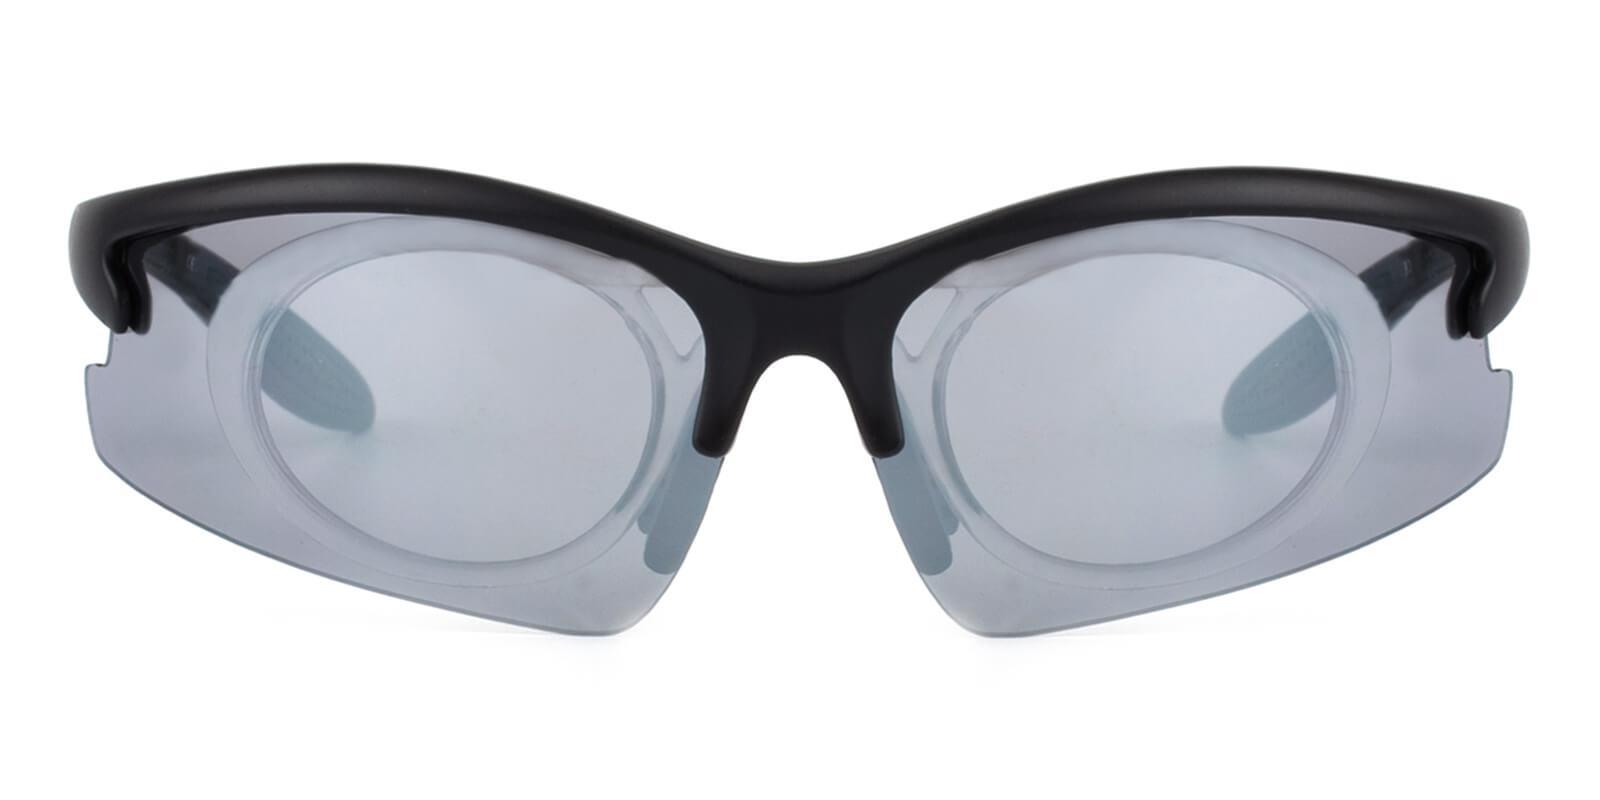 Windrise-Black-Square-Plastic-SportsGlasses-additional2